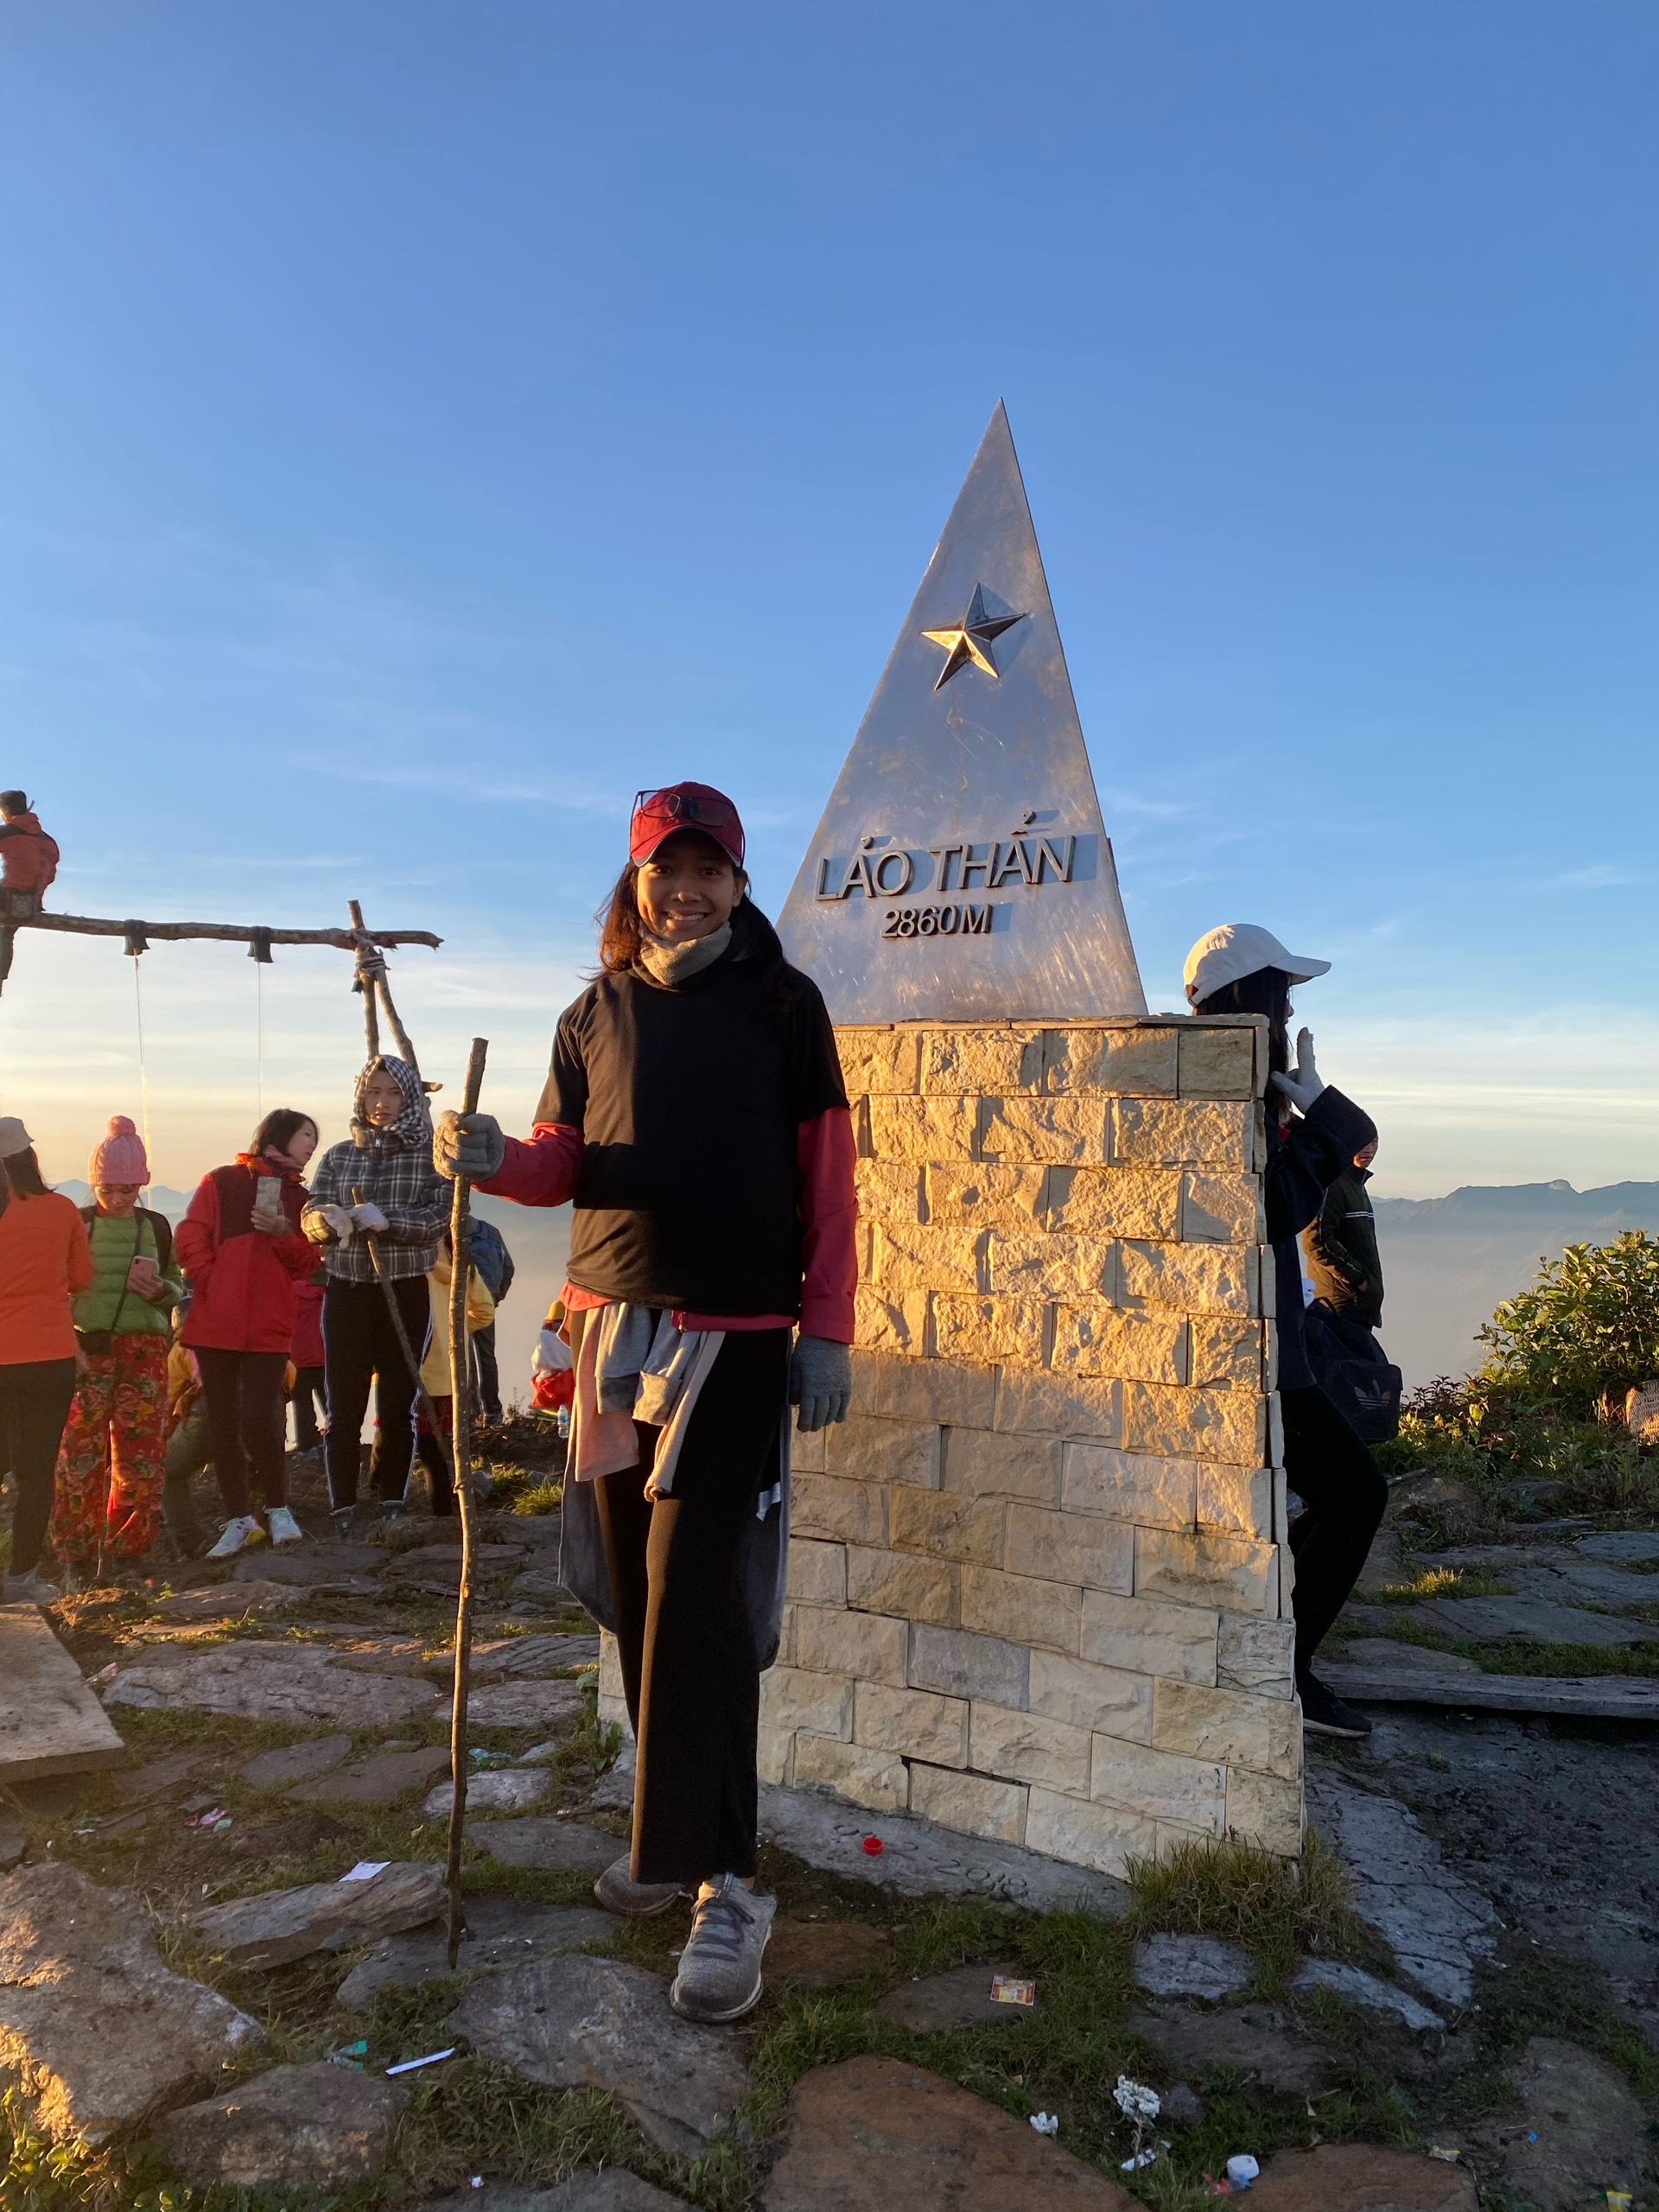 On the peak of Lao Than mountain (Lao Cai).